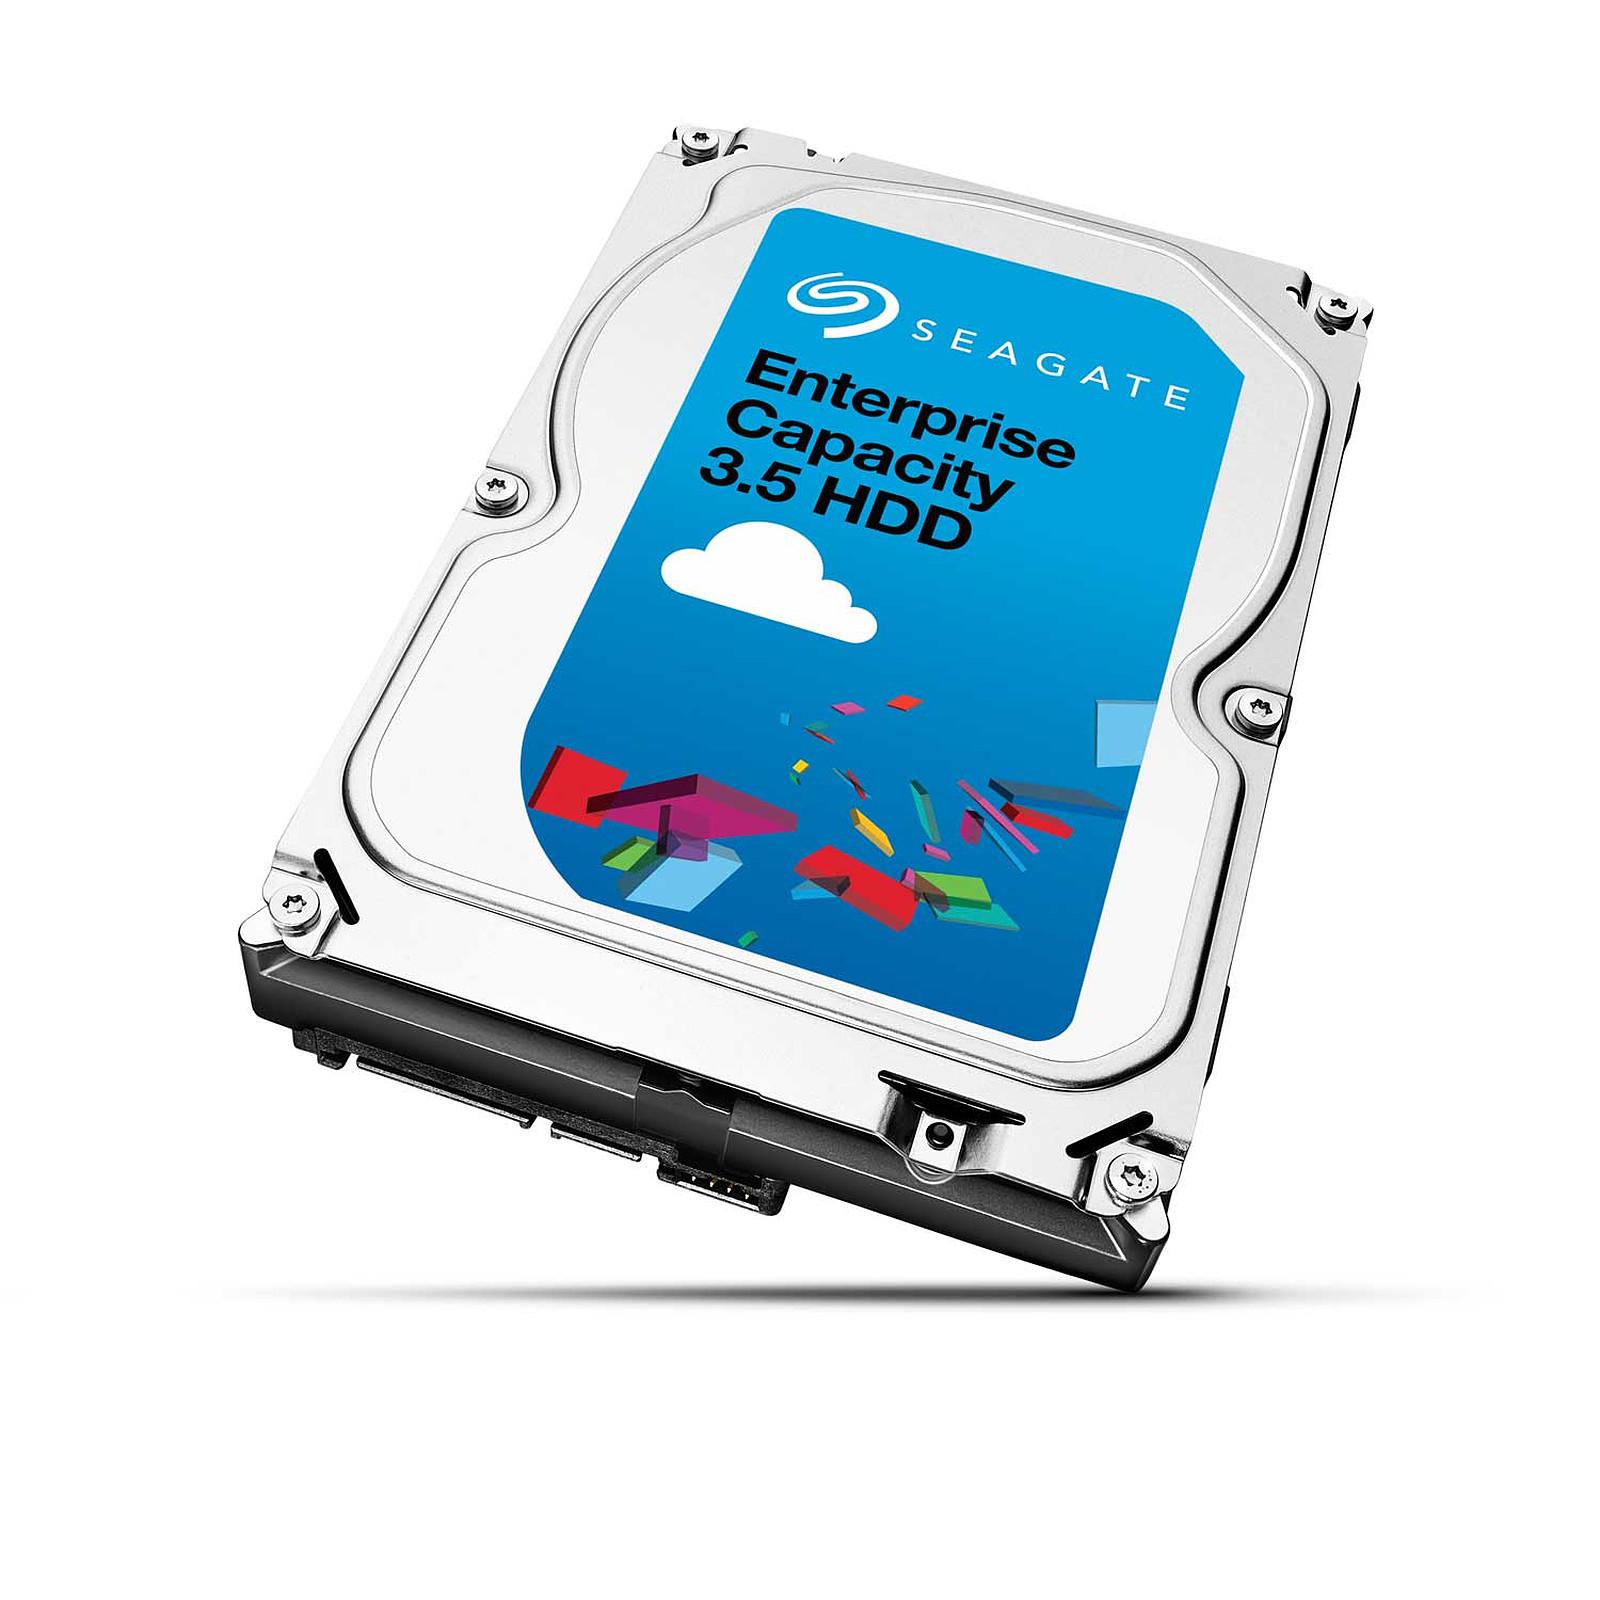 Seagate Enterprise Capacity 3.5 HDD SAS 6 Gbits/s 1 To